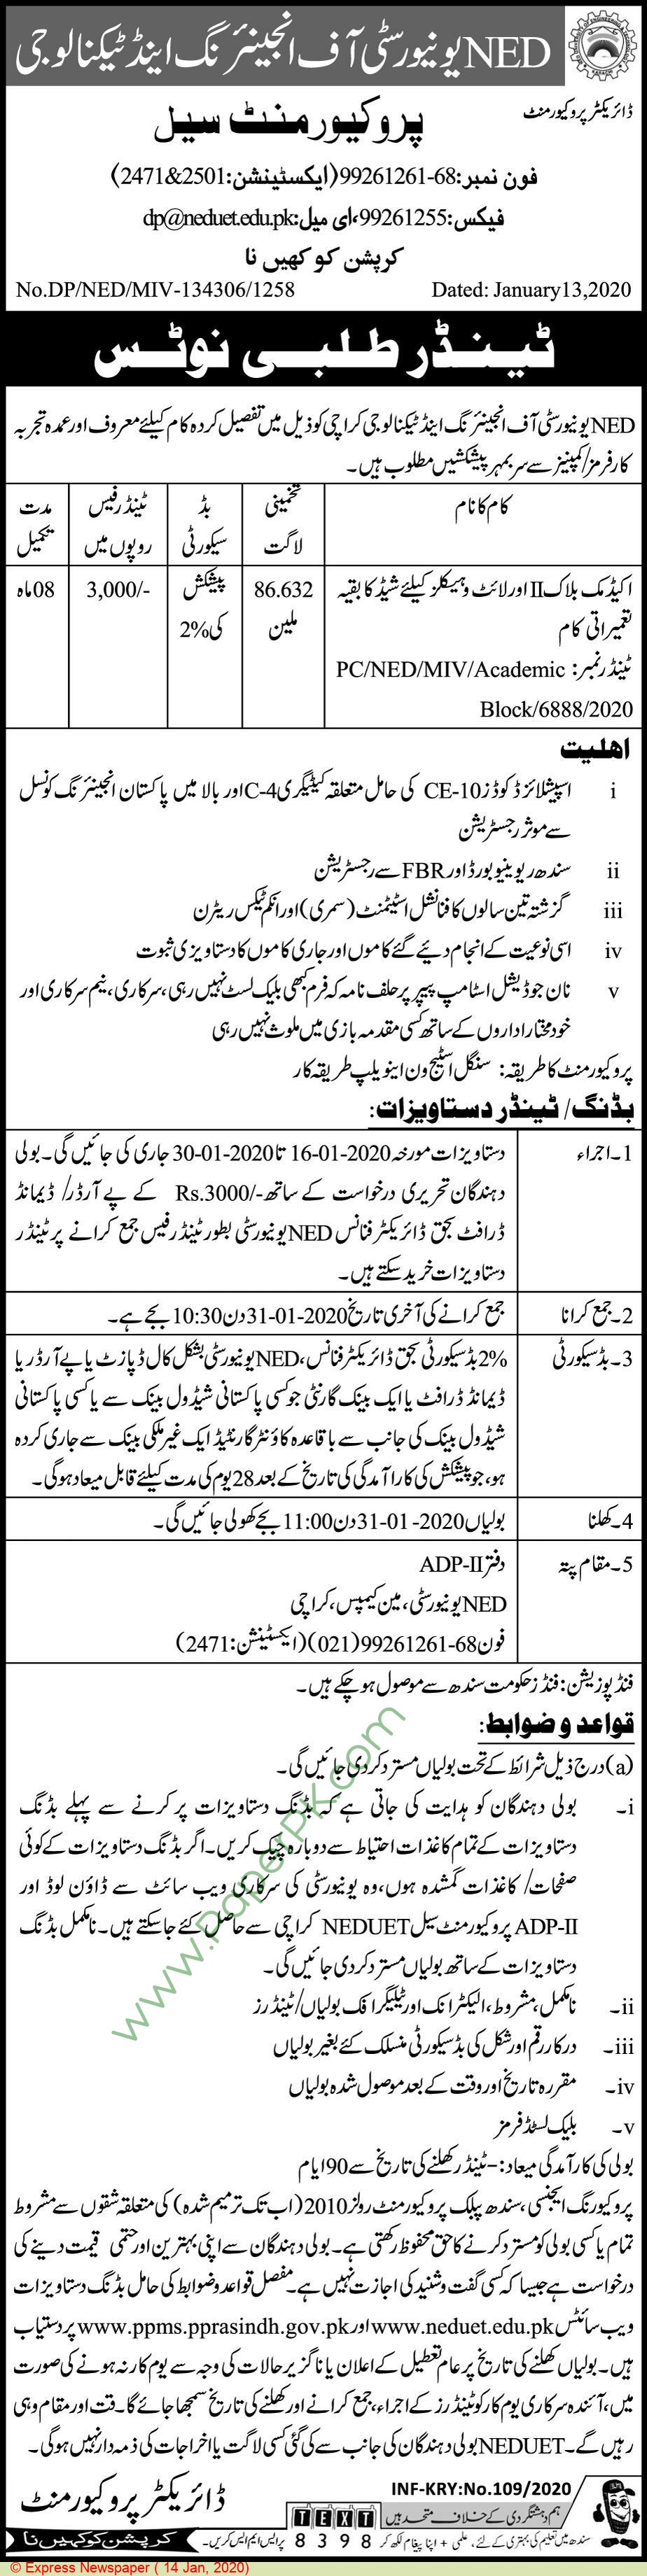 Ned University Of Engineering & Technology Karachi Tender Notice